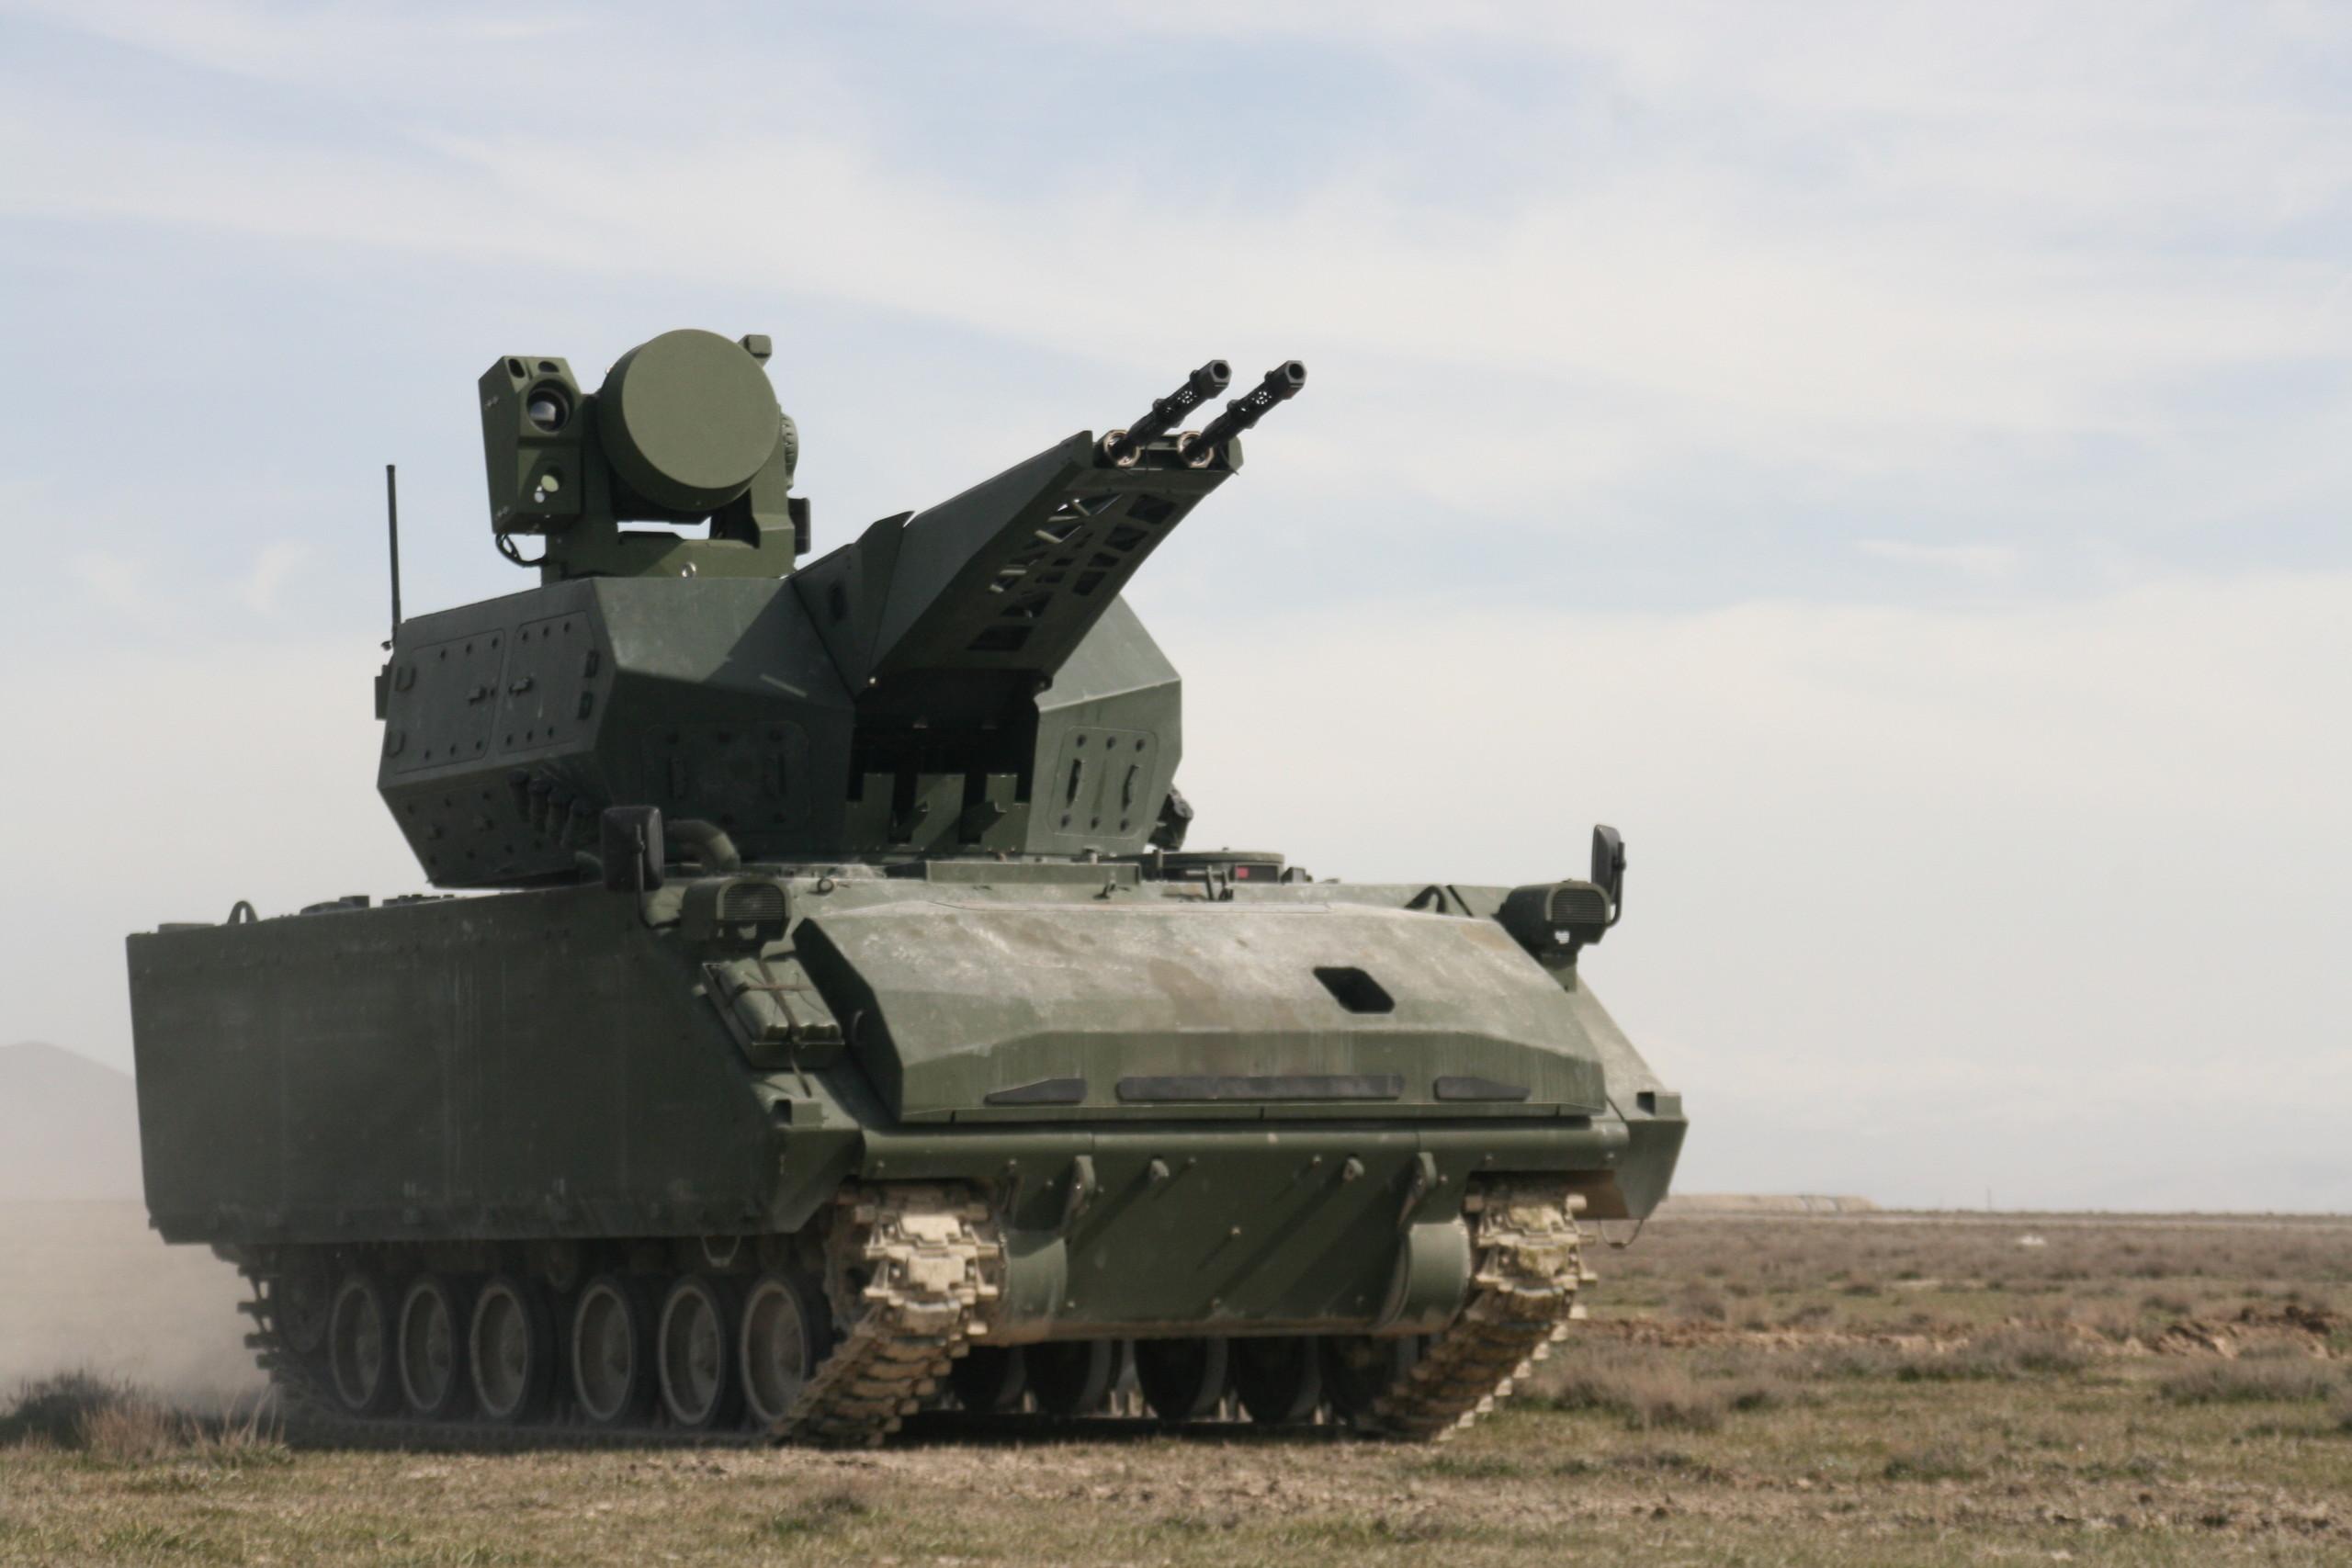 Turkish Ground Forces AFVs and Tanks LQbkAZ